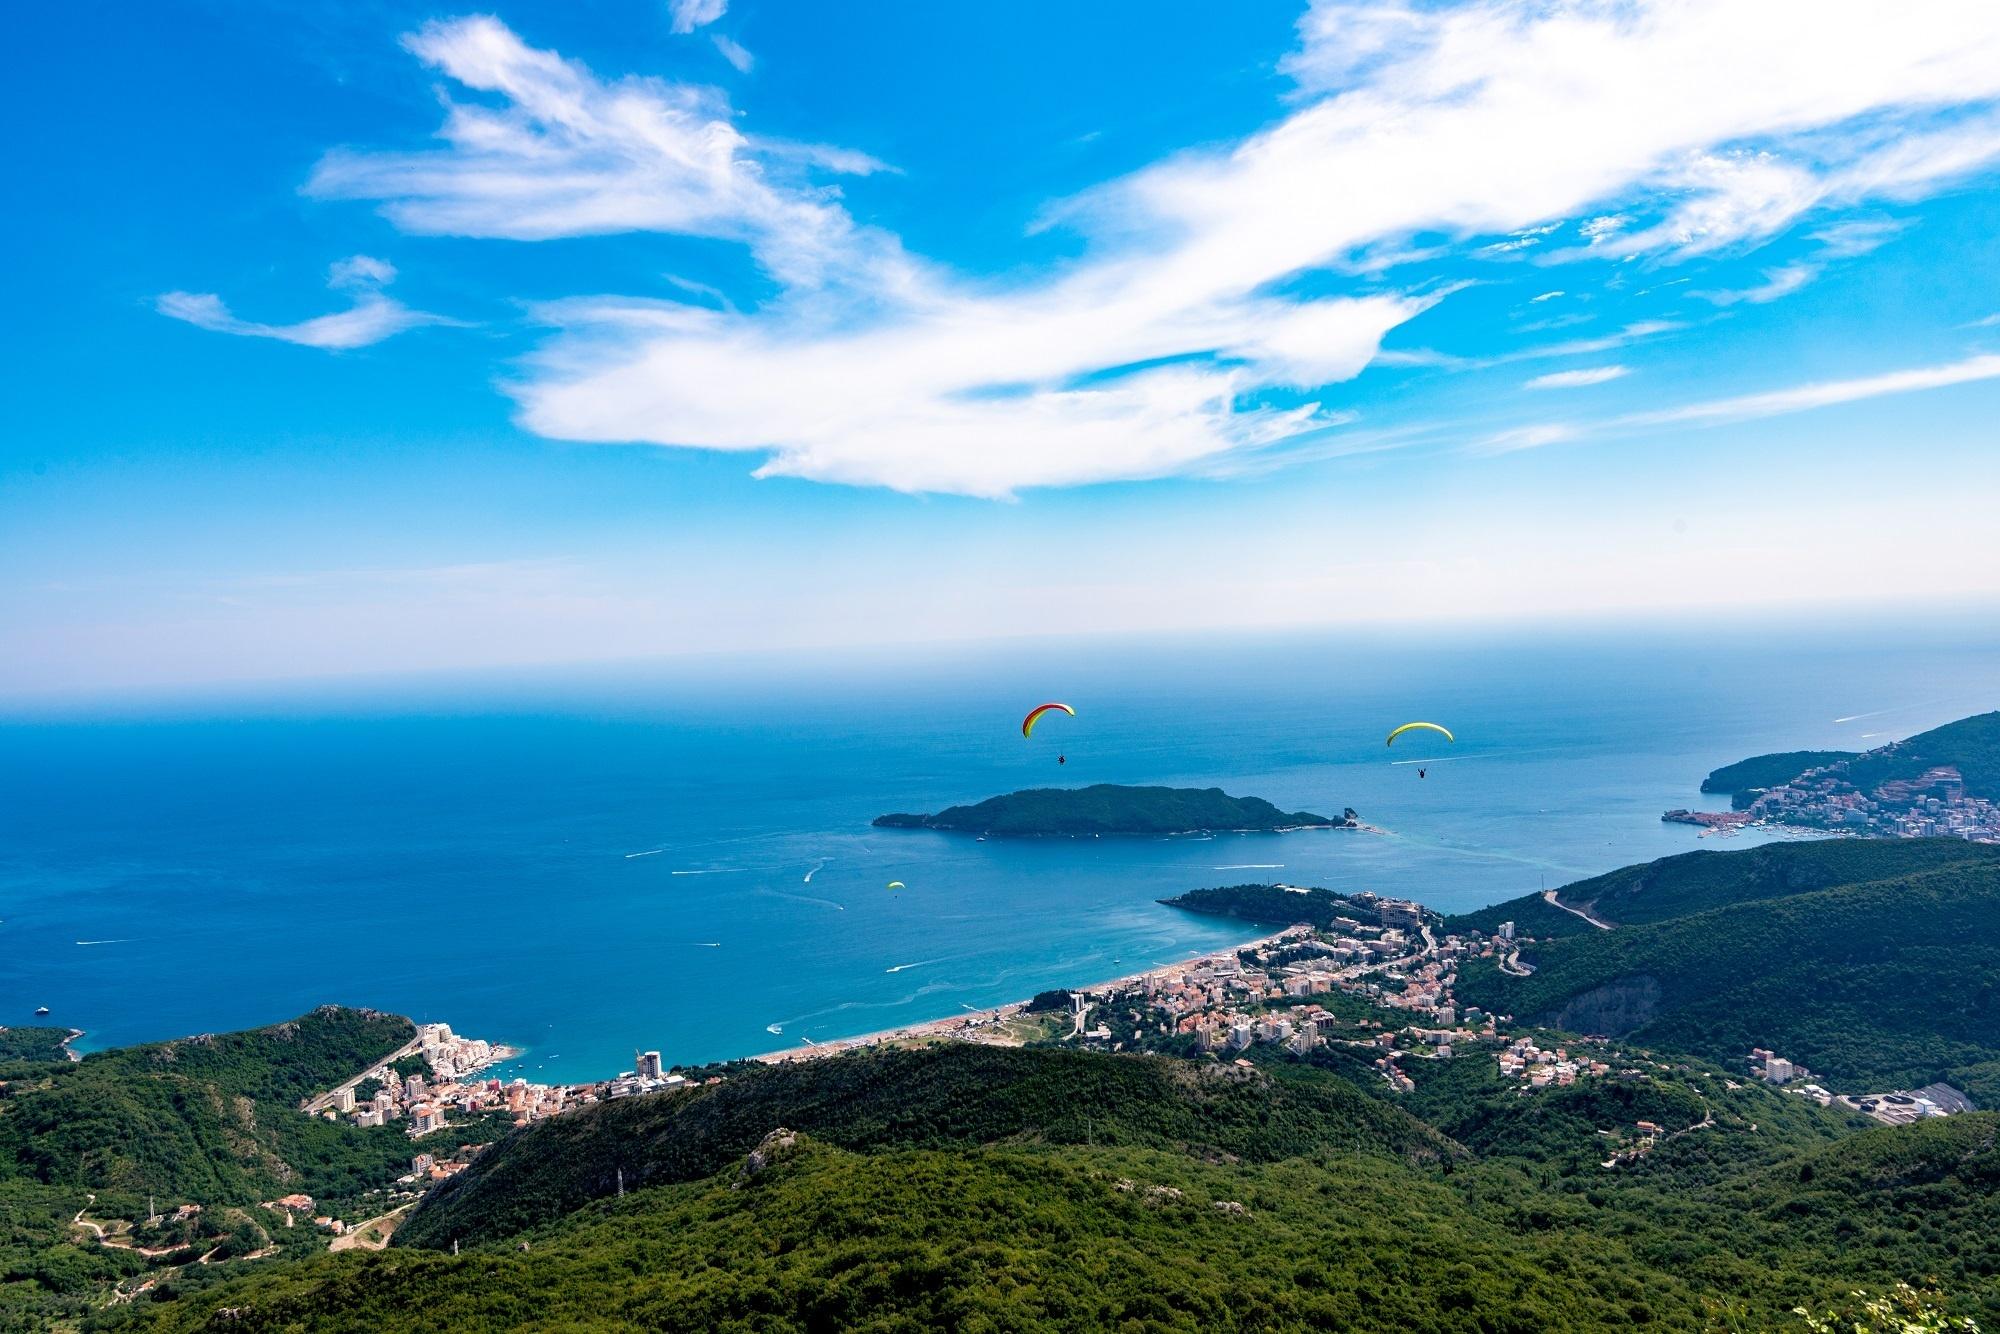 Paragliding in Montenegro